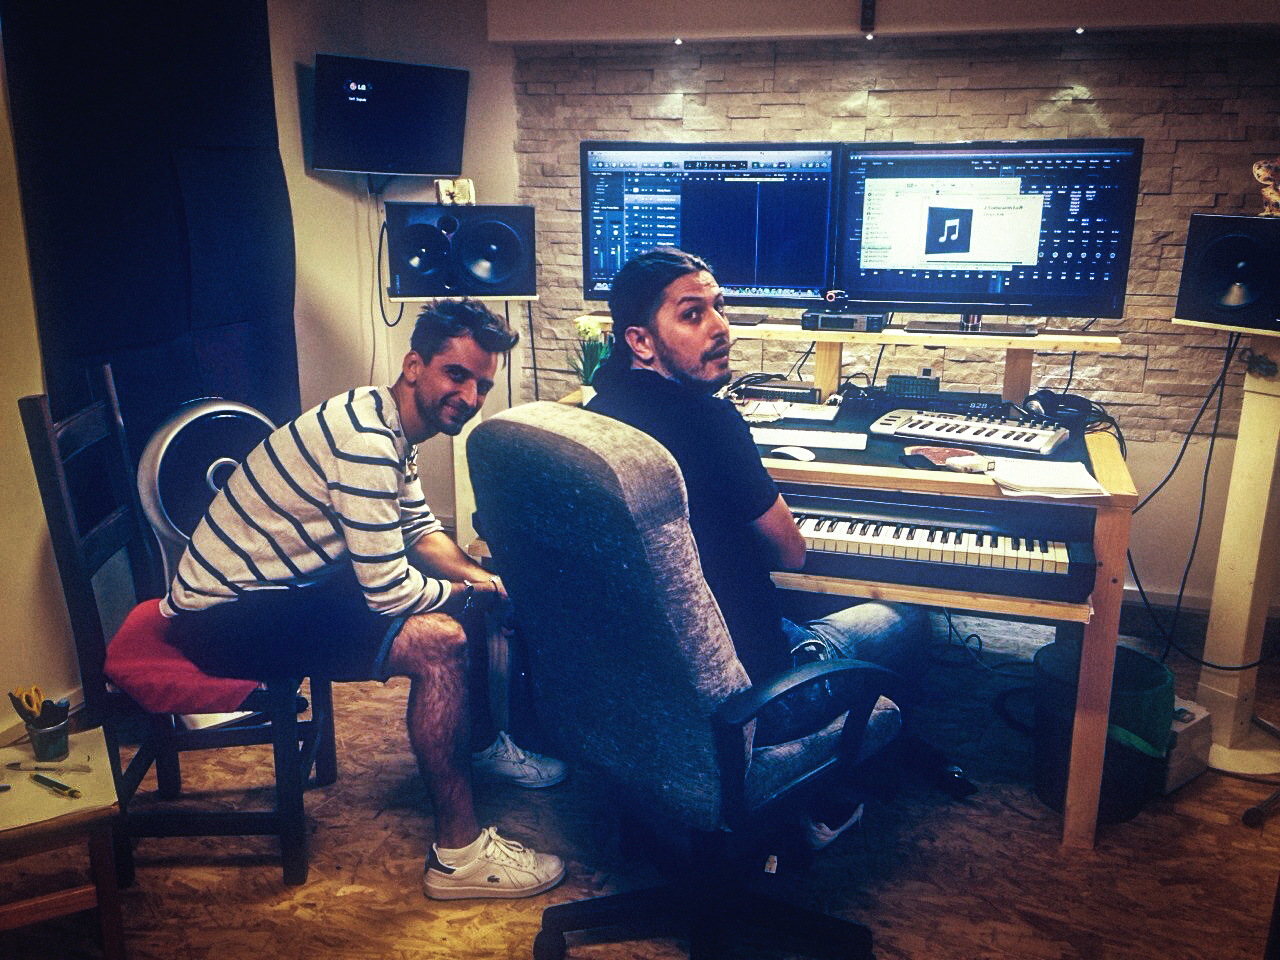 Alanas Marco Lo Russo Rouge recording studio 7 days